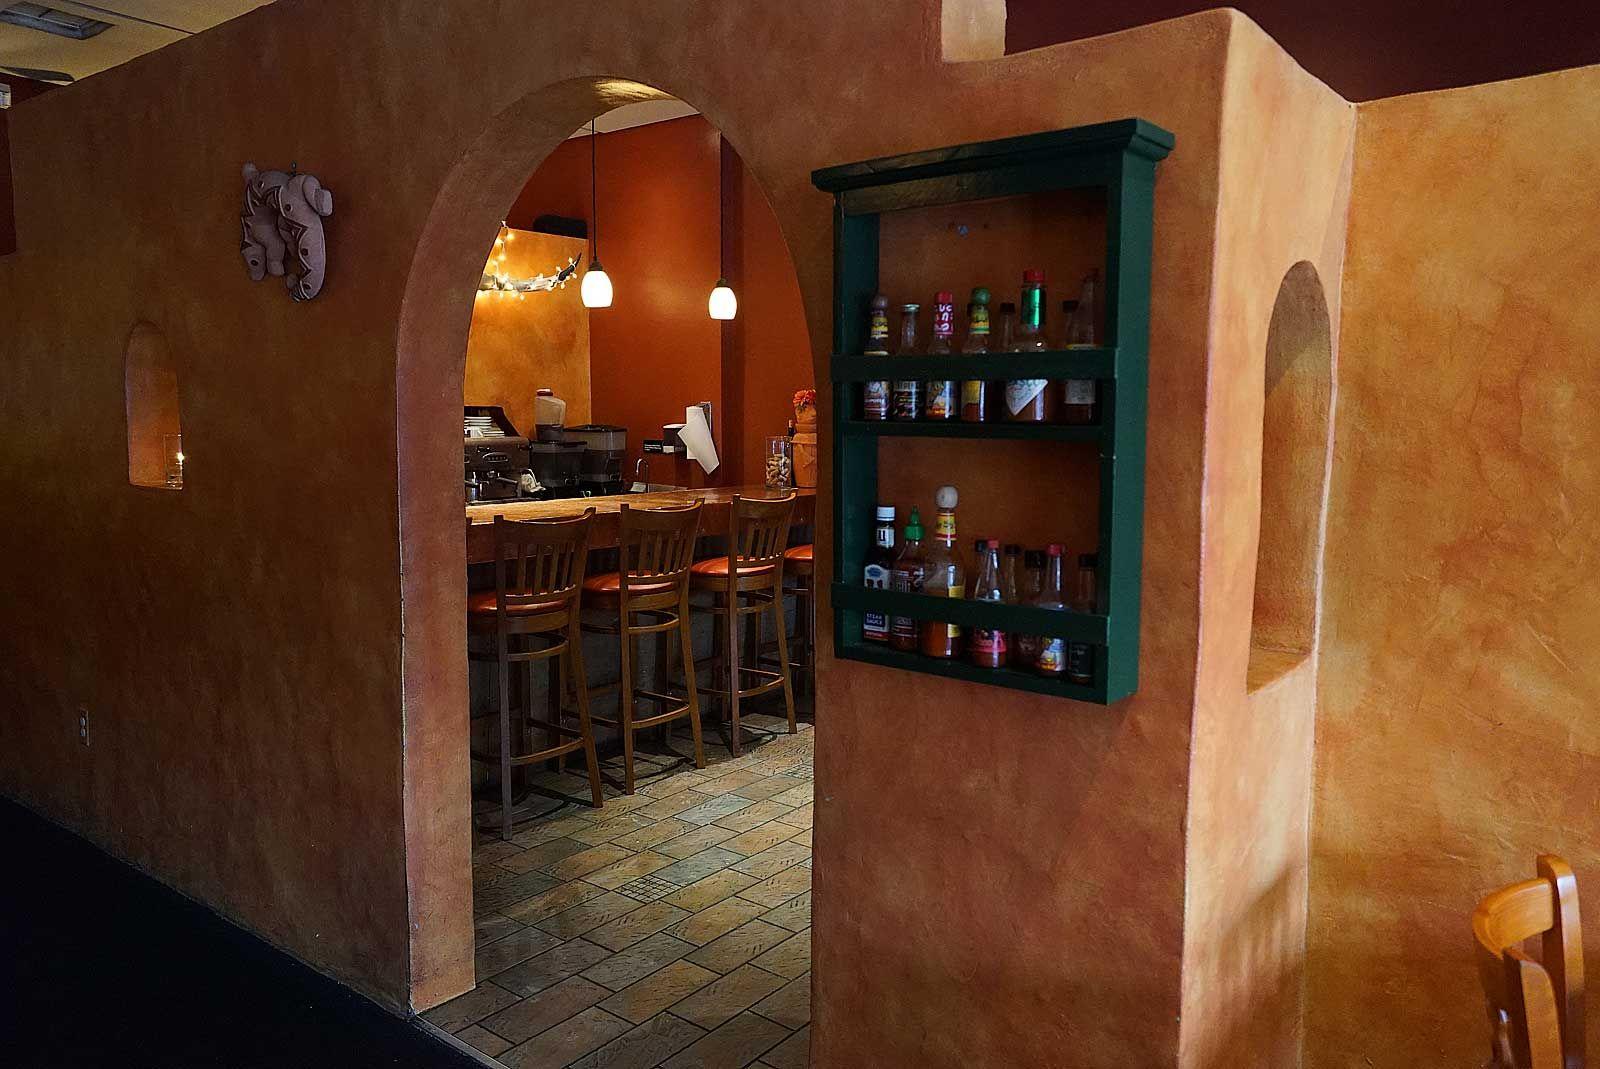 Mojave Grille Grilles, Liquor Home decor